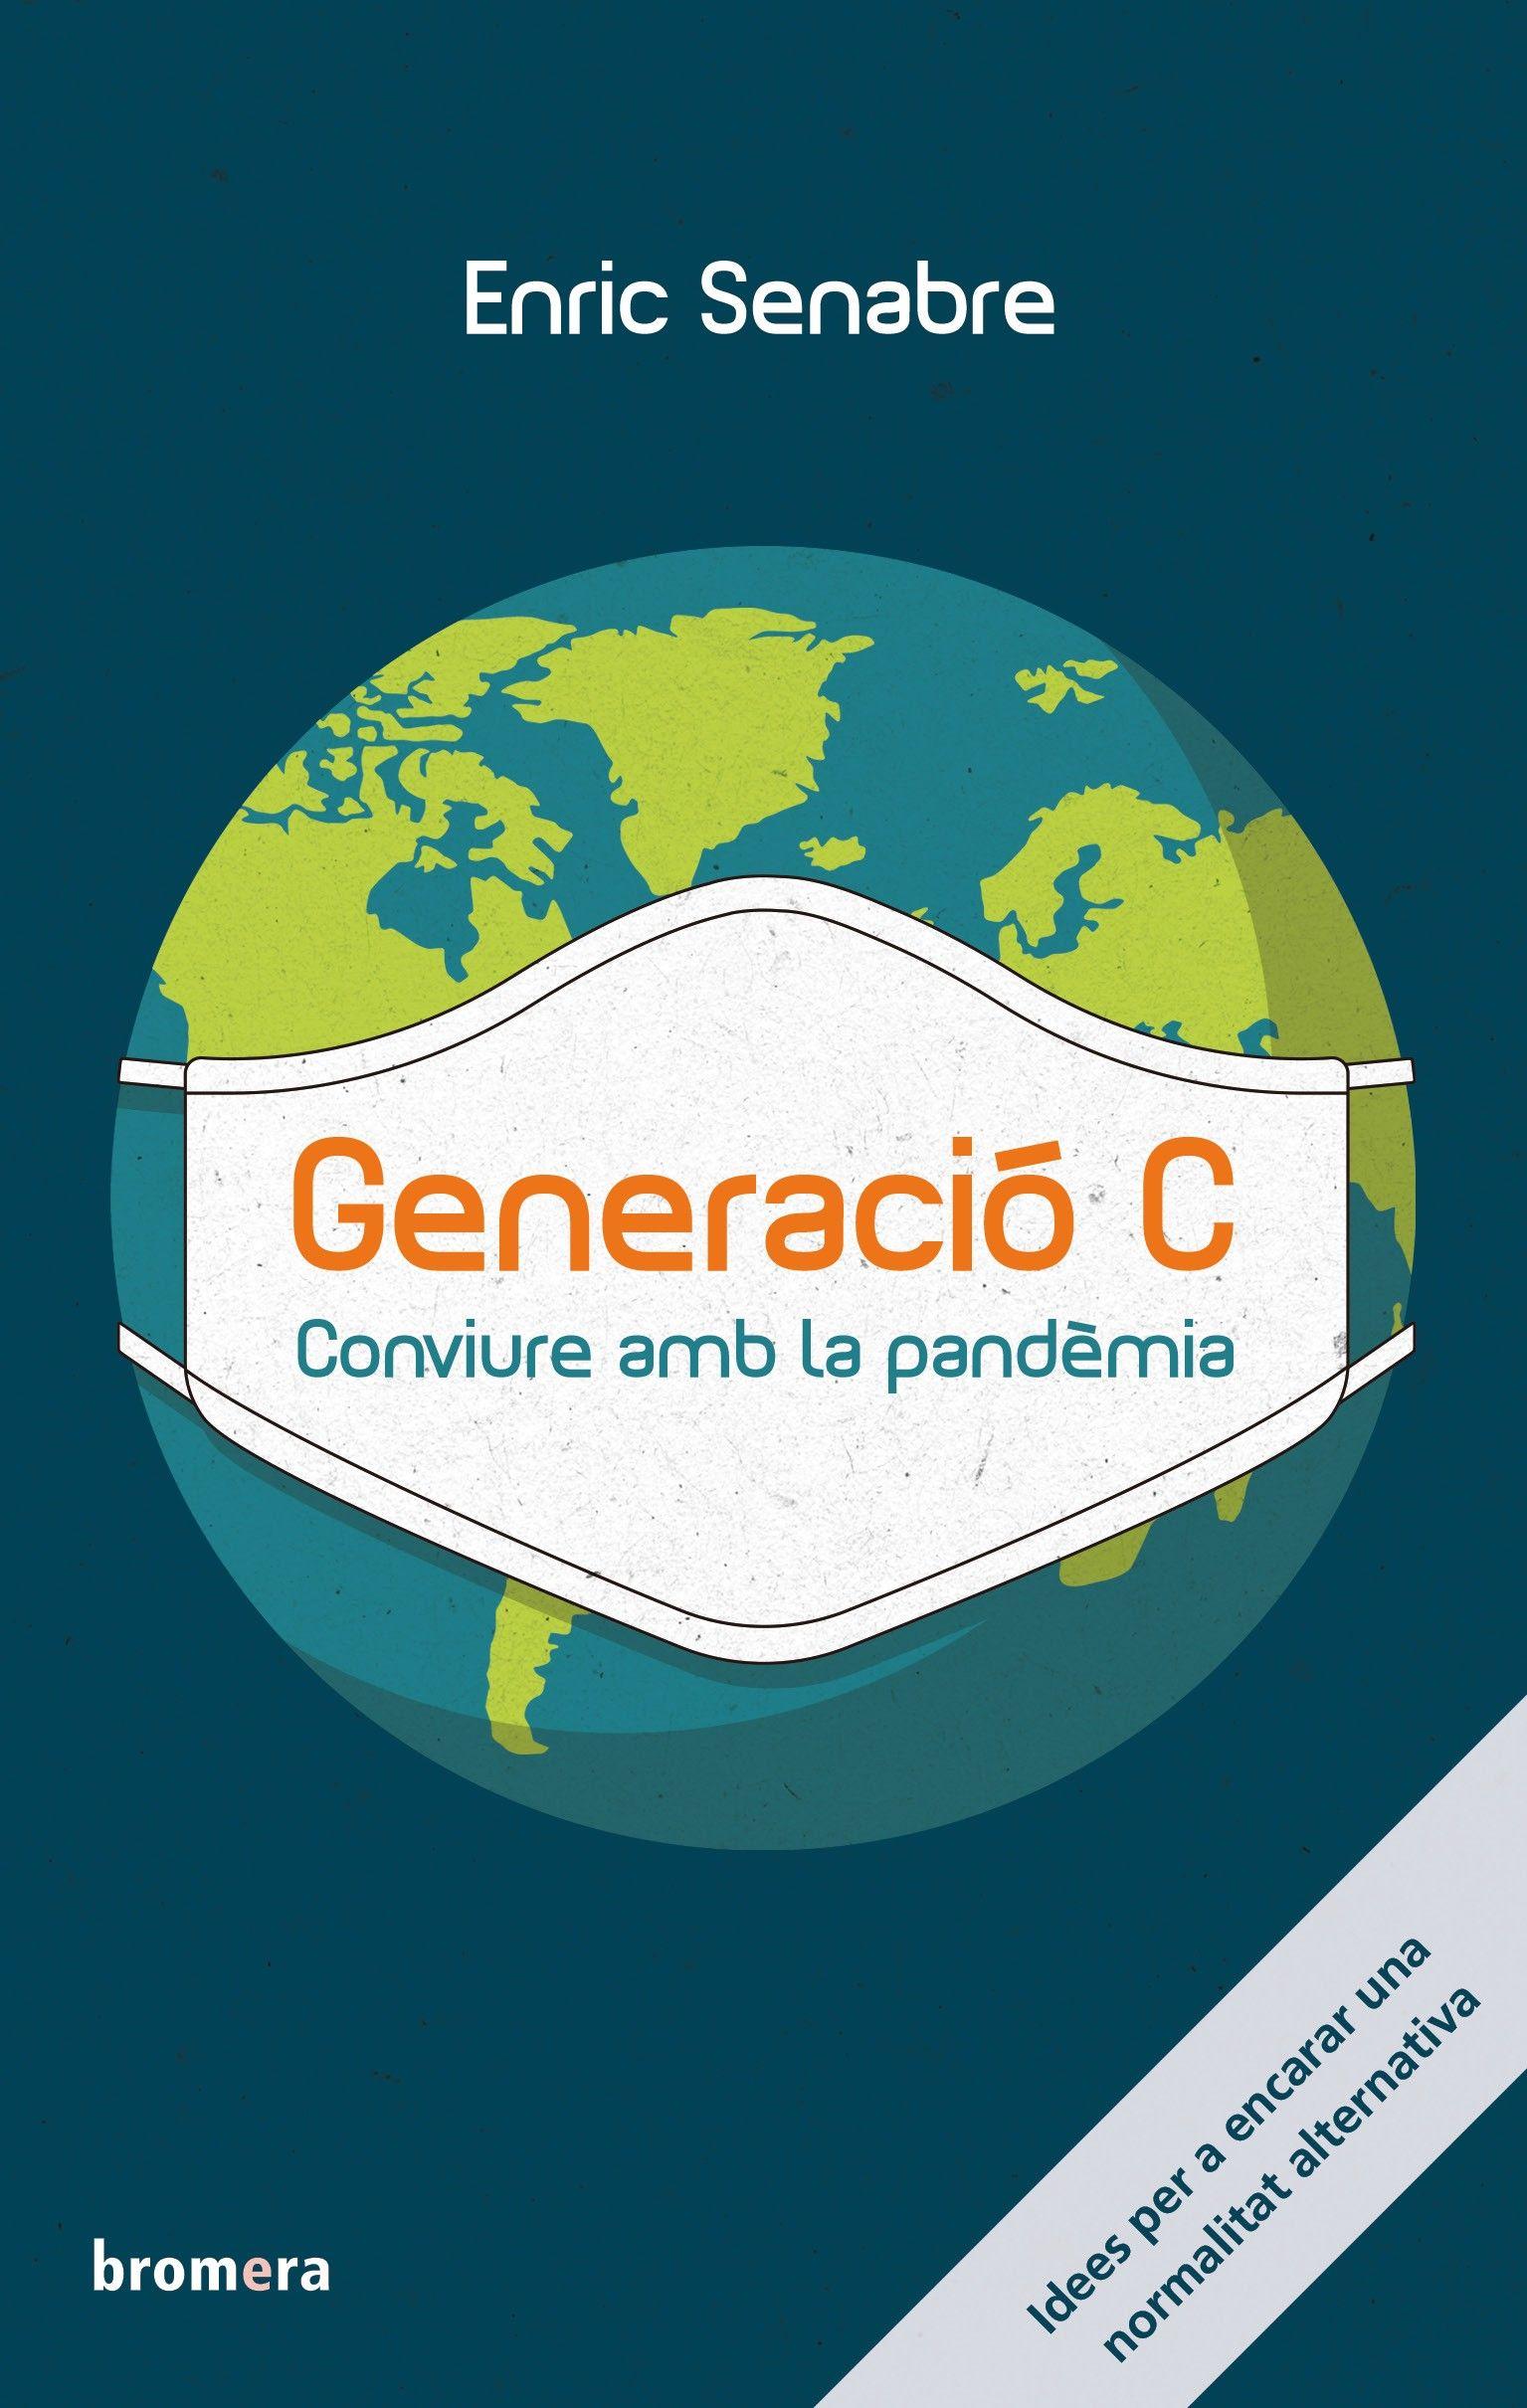 GENERACIO C CONVIURE AMB LA PANDEMIA